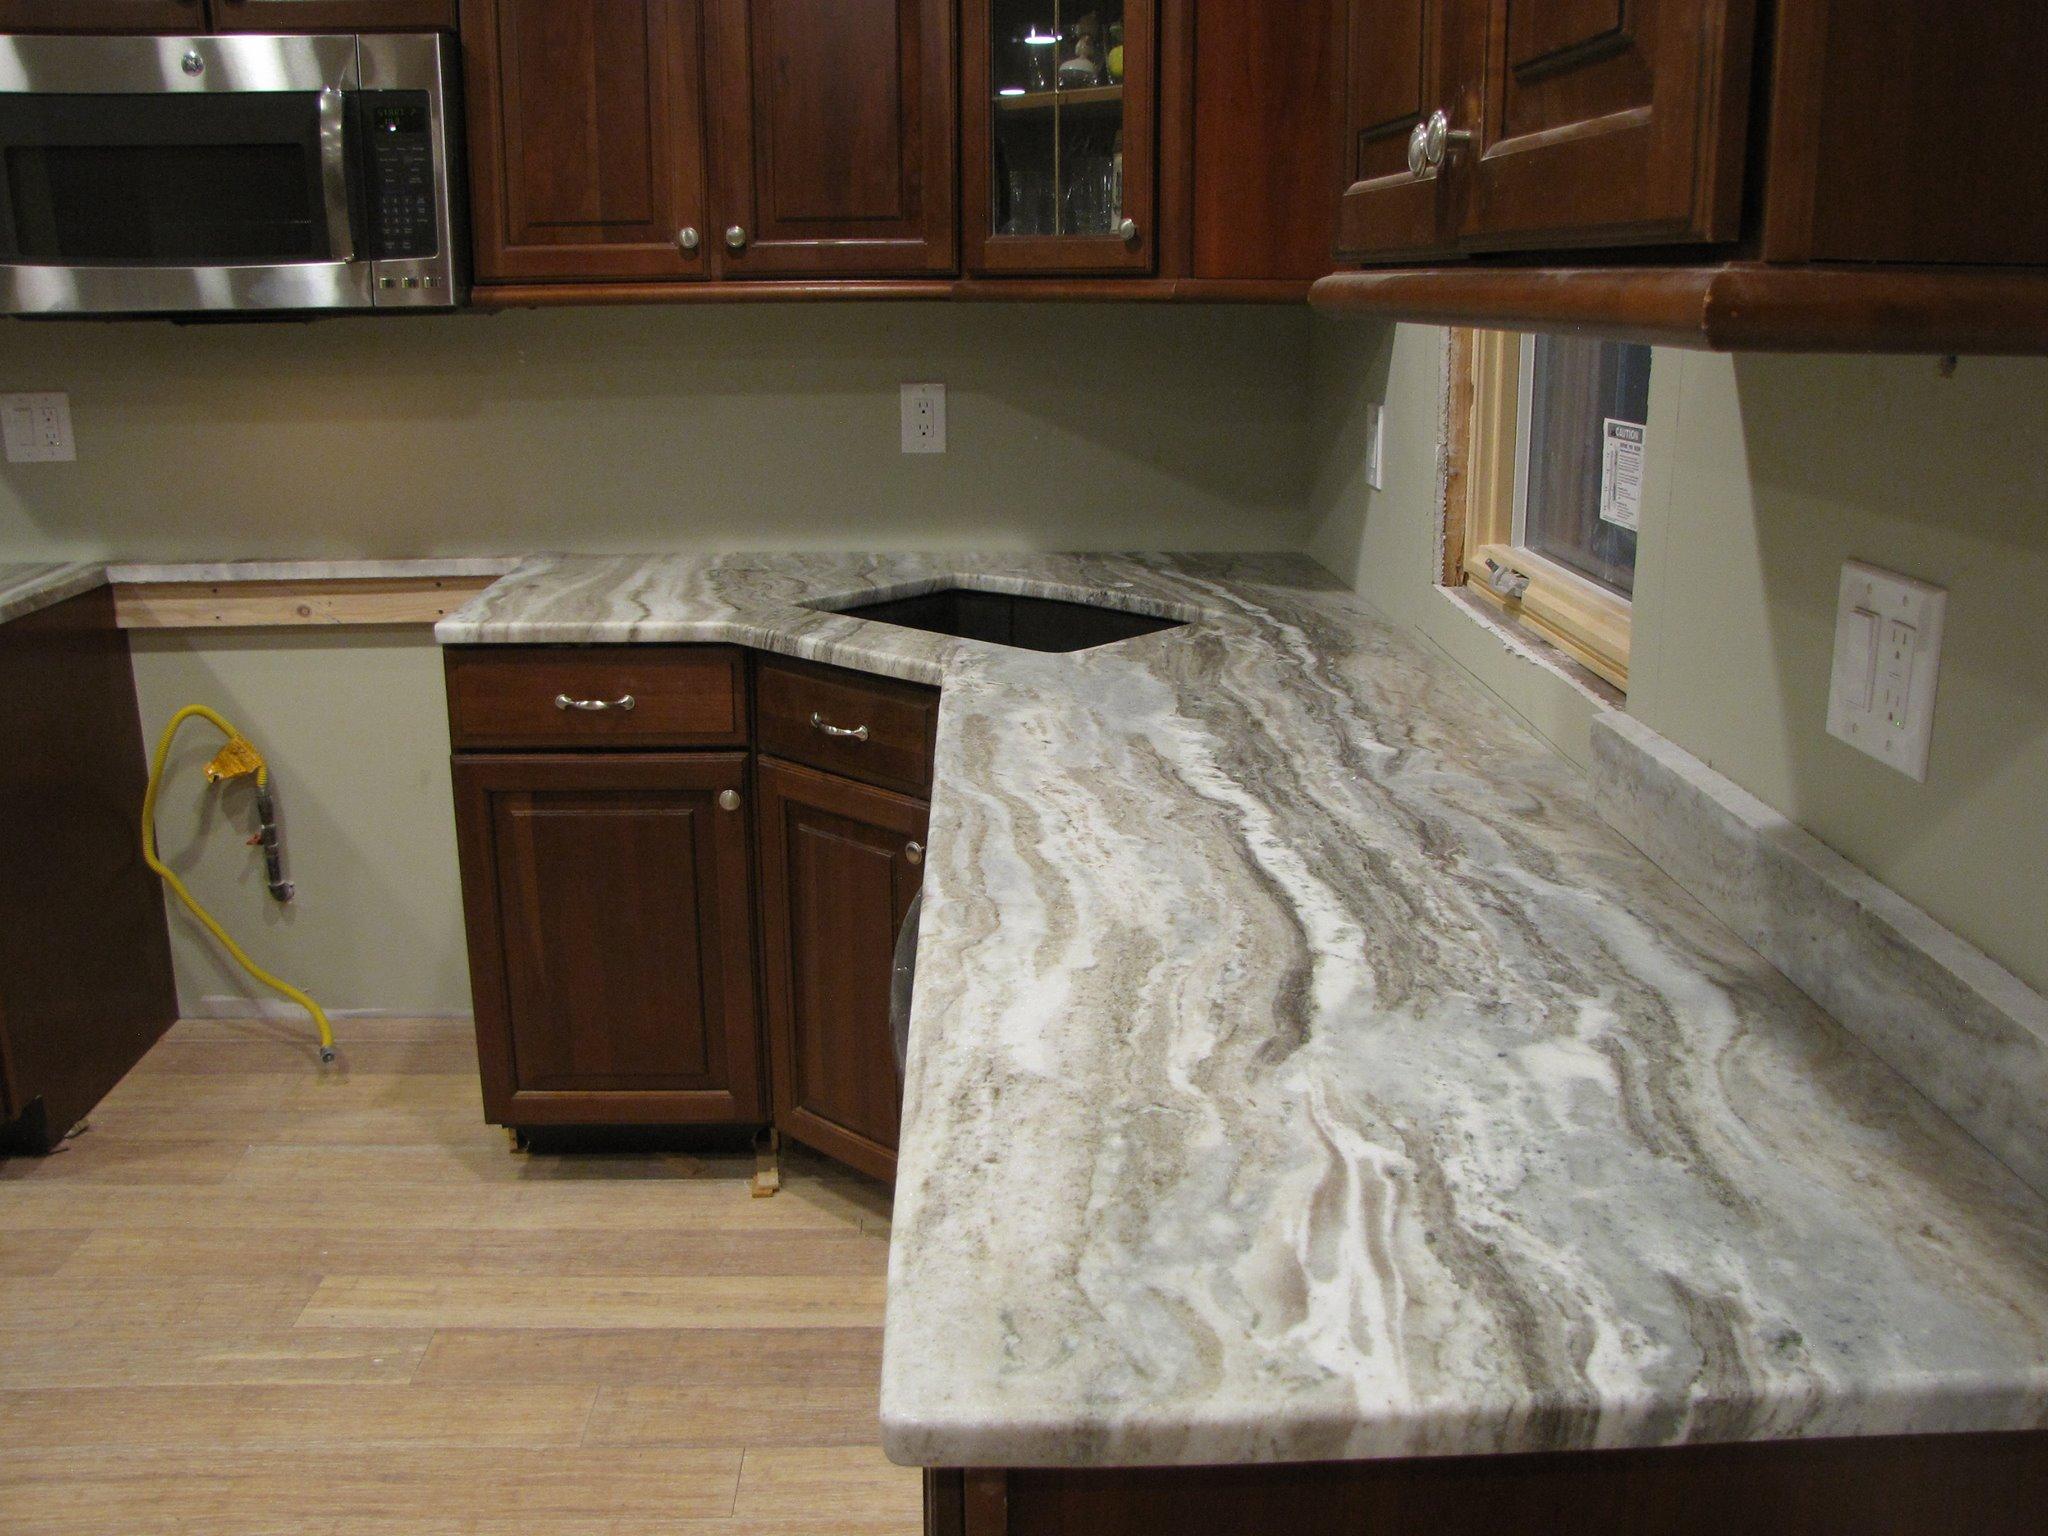 long island NY white countertops undermount sink2